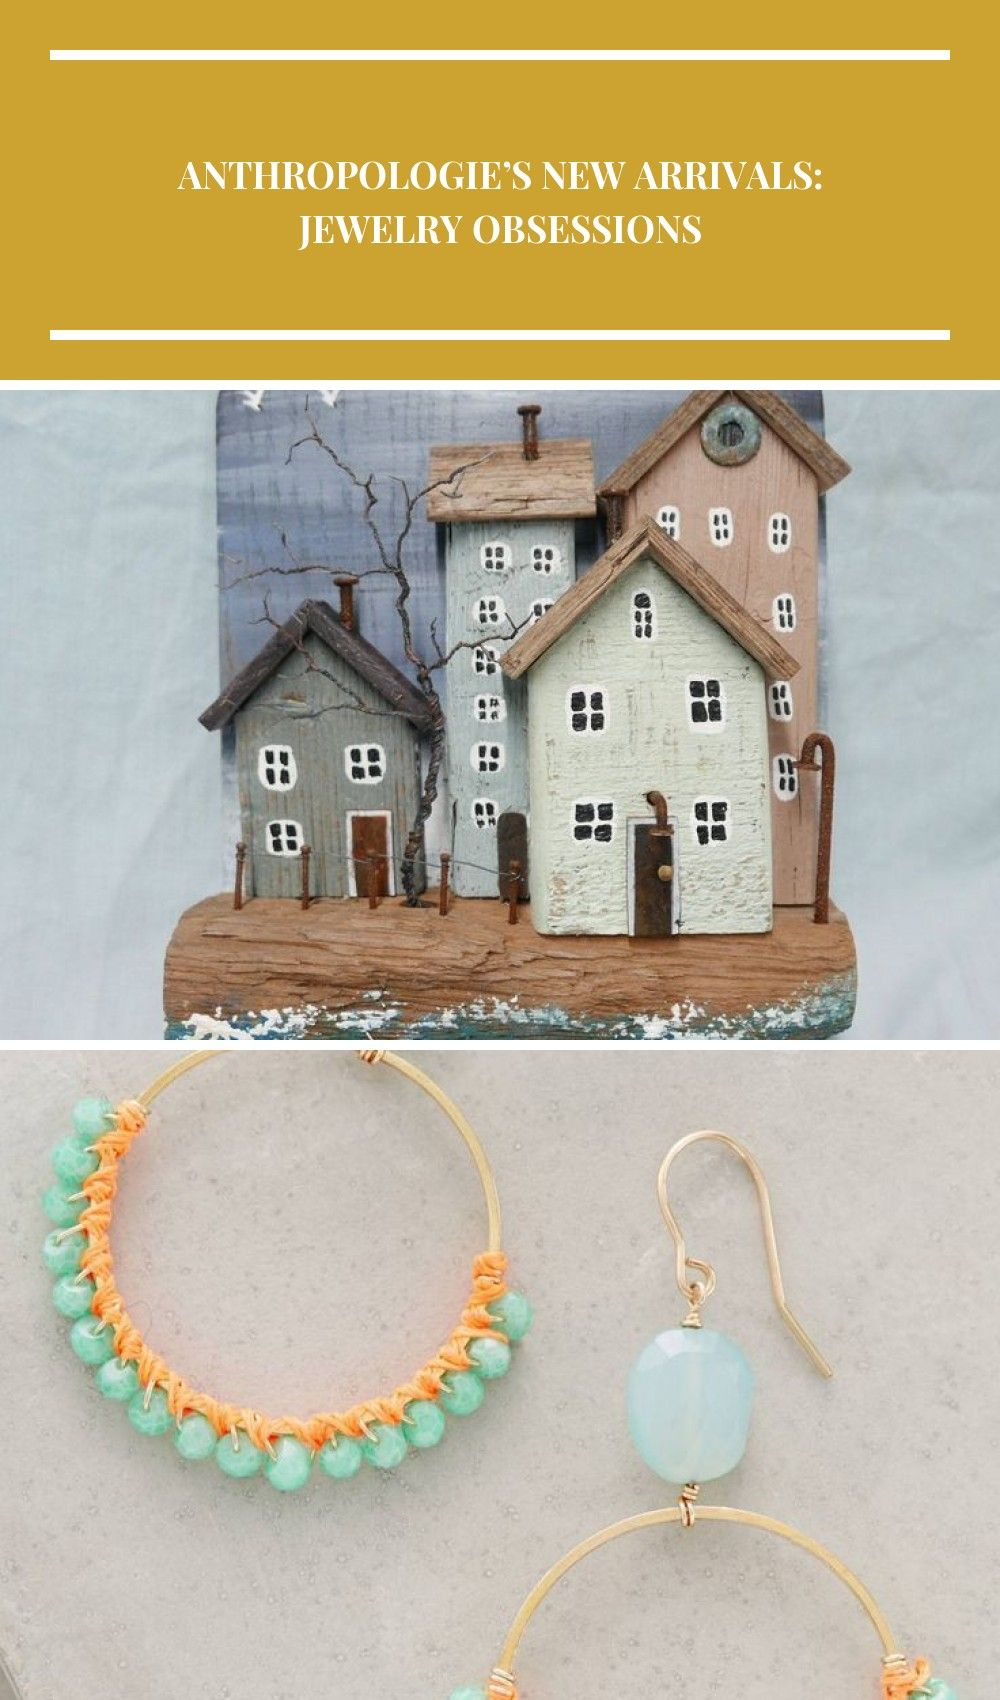 3 Marvelous Clever Hacks Jewelry Stand Tips luxury jewelry caseJewelry Storage  Holz  fashion jewelry diy